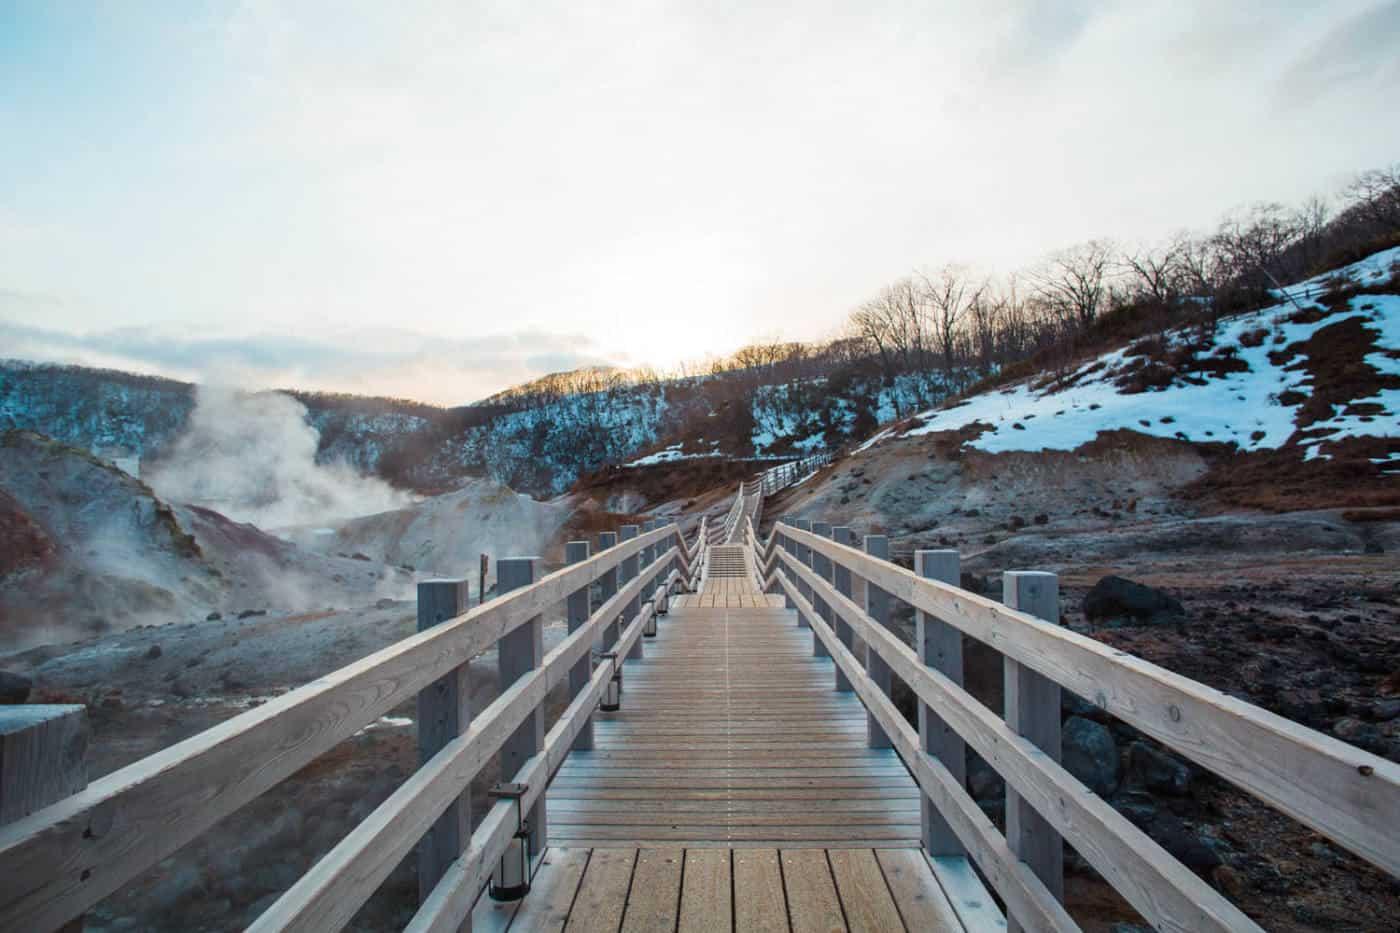 A boardwalk in Jigokudani during winter in Hokkaido Japan